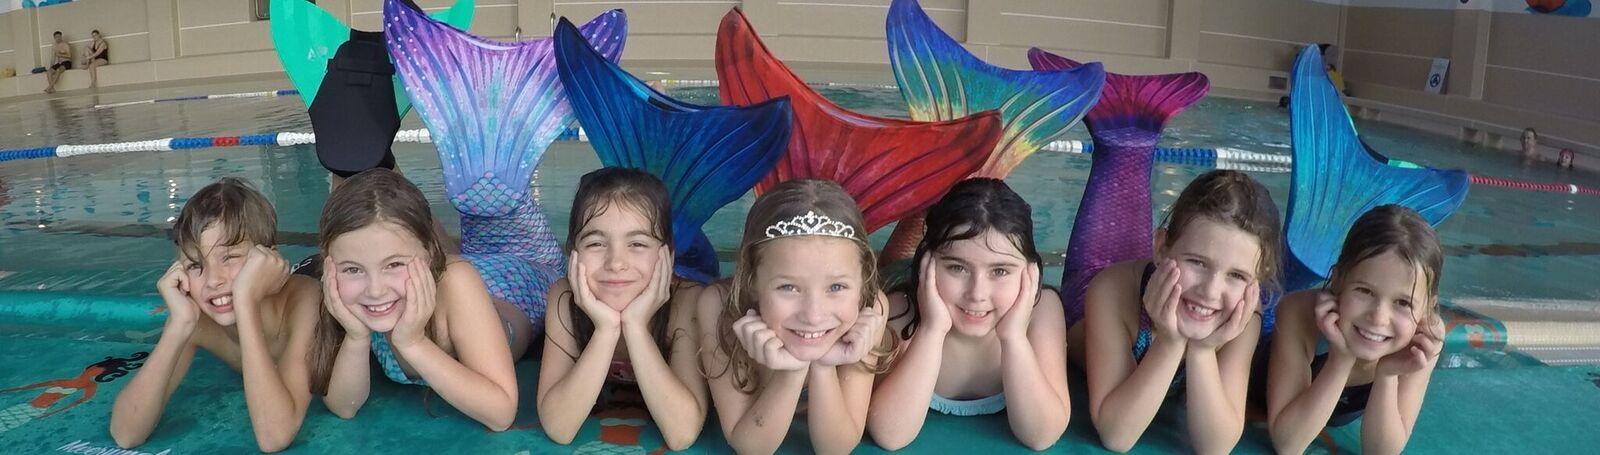 Sun Tail Mermaid